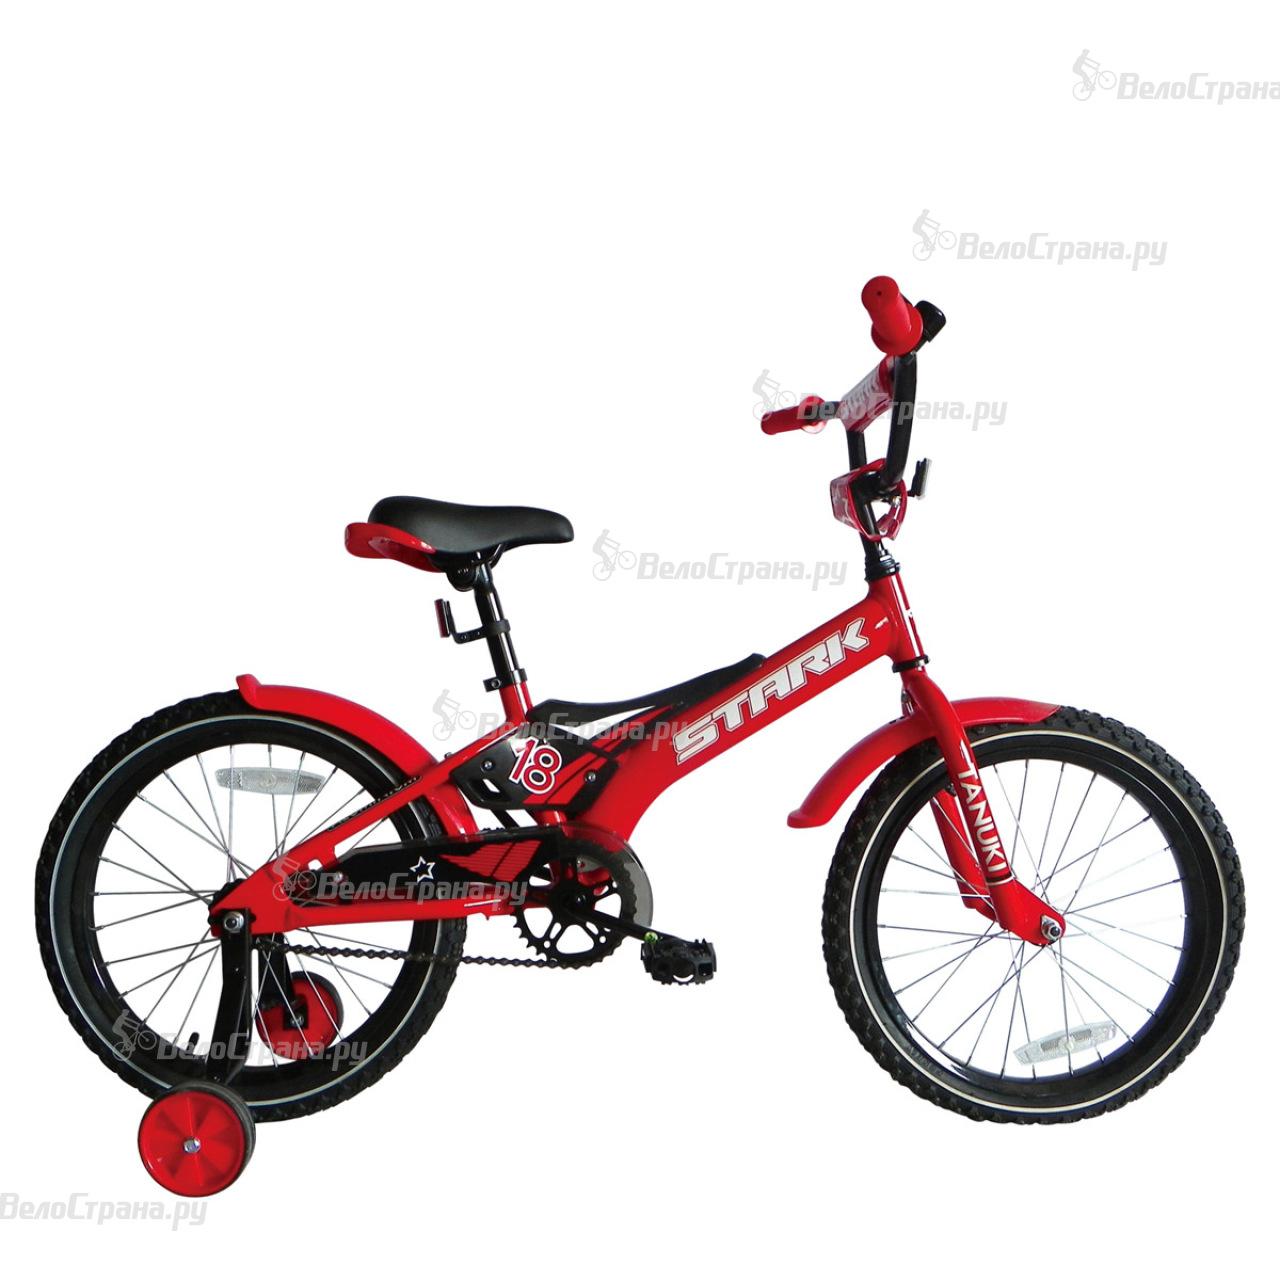 Велосипед Stark Tanuki 18 Boy (2017) велосипед velolider rush army 18 ra18 хаки